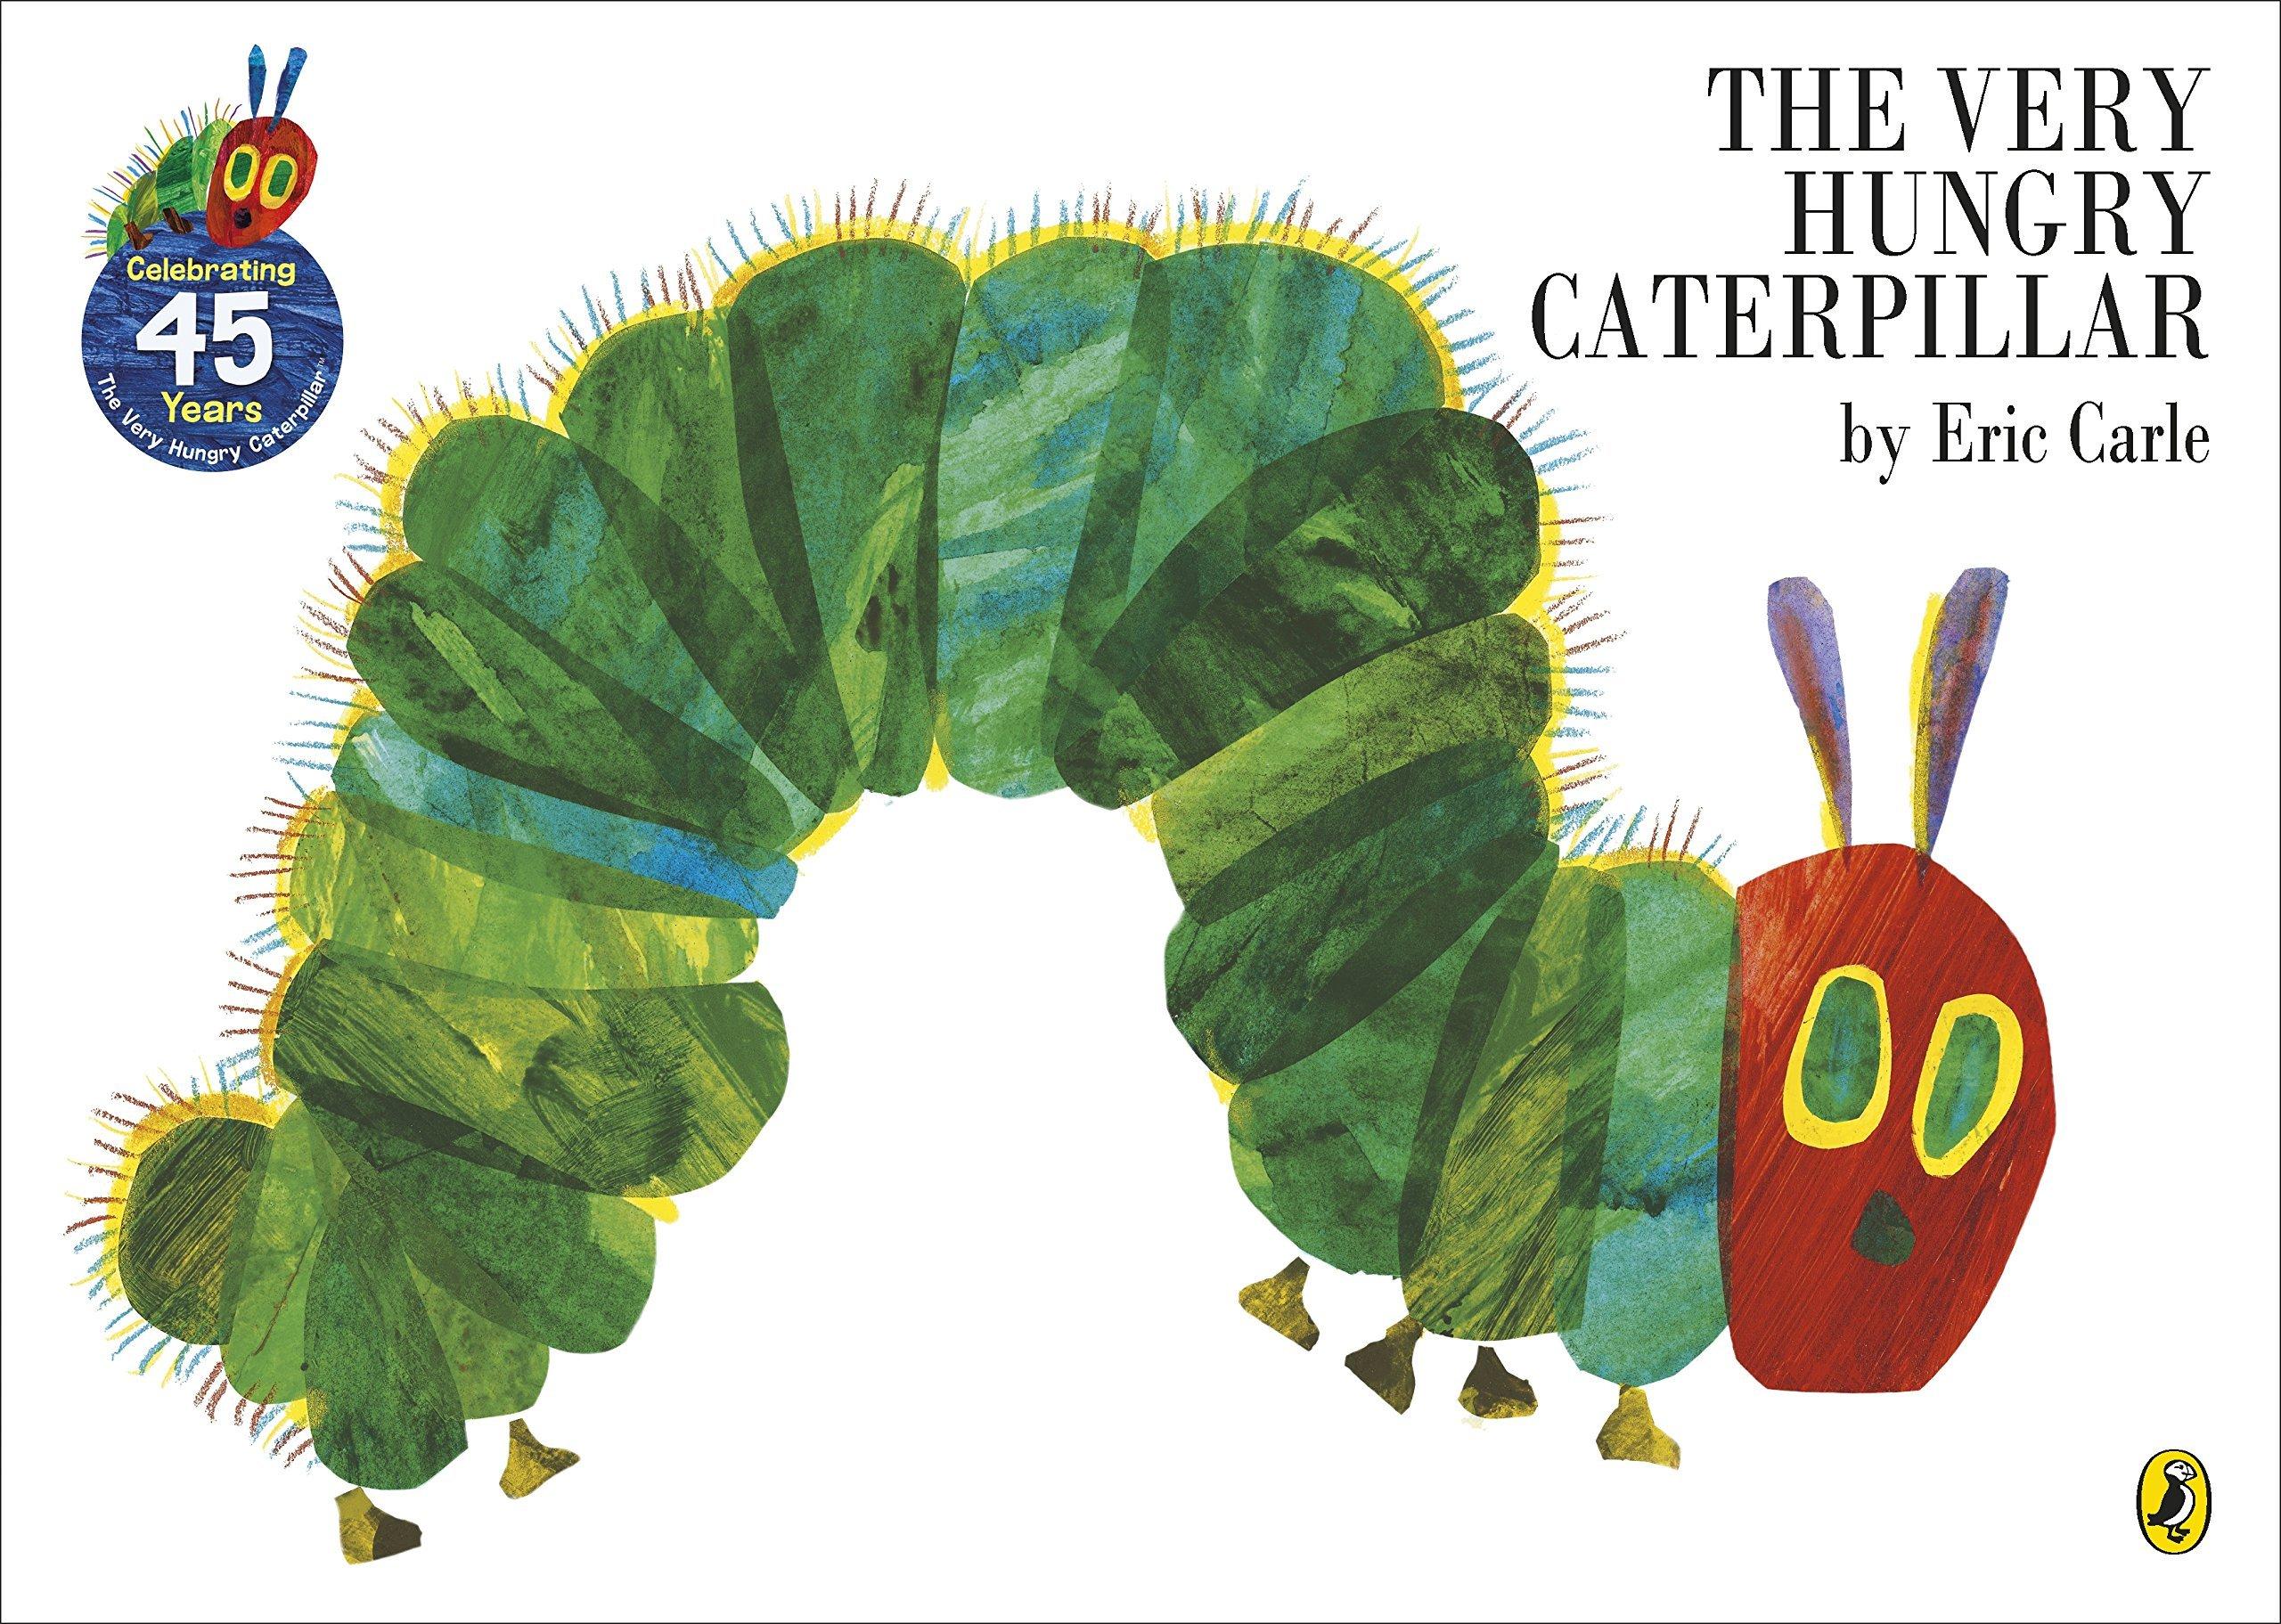 The very hungry caterpillar amazon eric carle roger the very hungry caterpillar amazon eric carle roger mcgough juliet stevenson 6919356197637 books nvjuhfo Choice Image